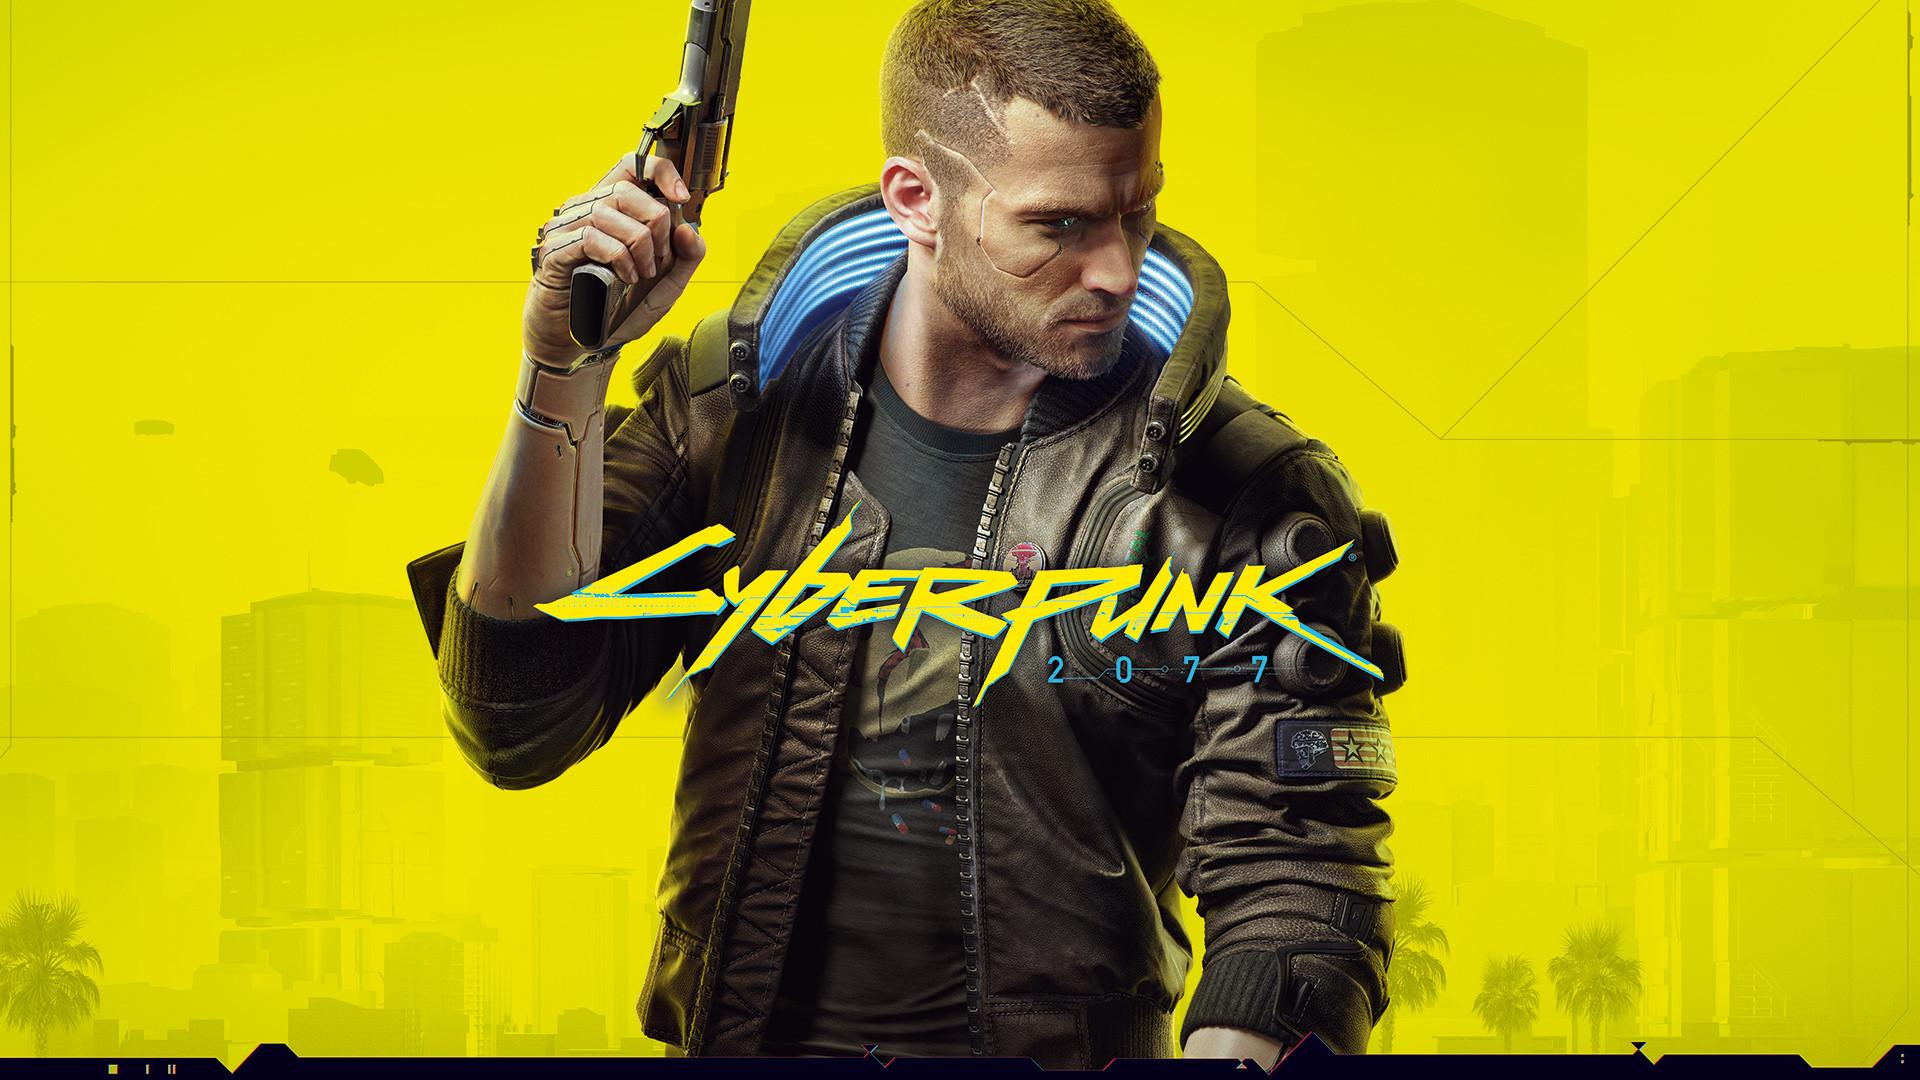 Cyberpunk 2077 برای عرضه در خاورمیانه تایید شد